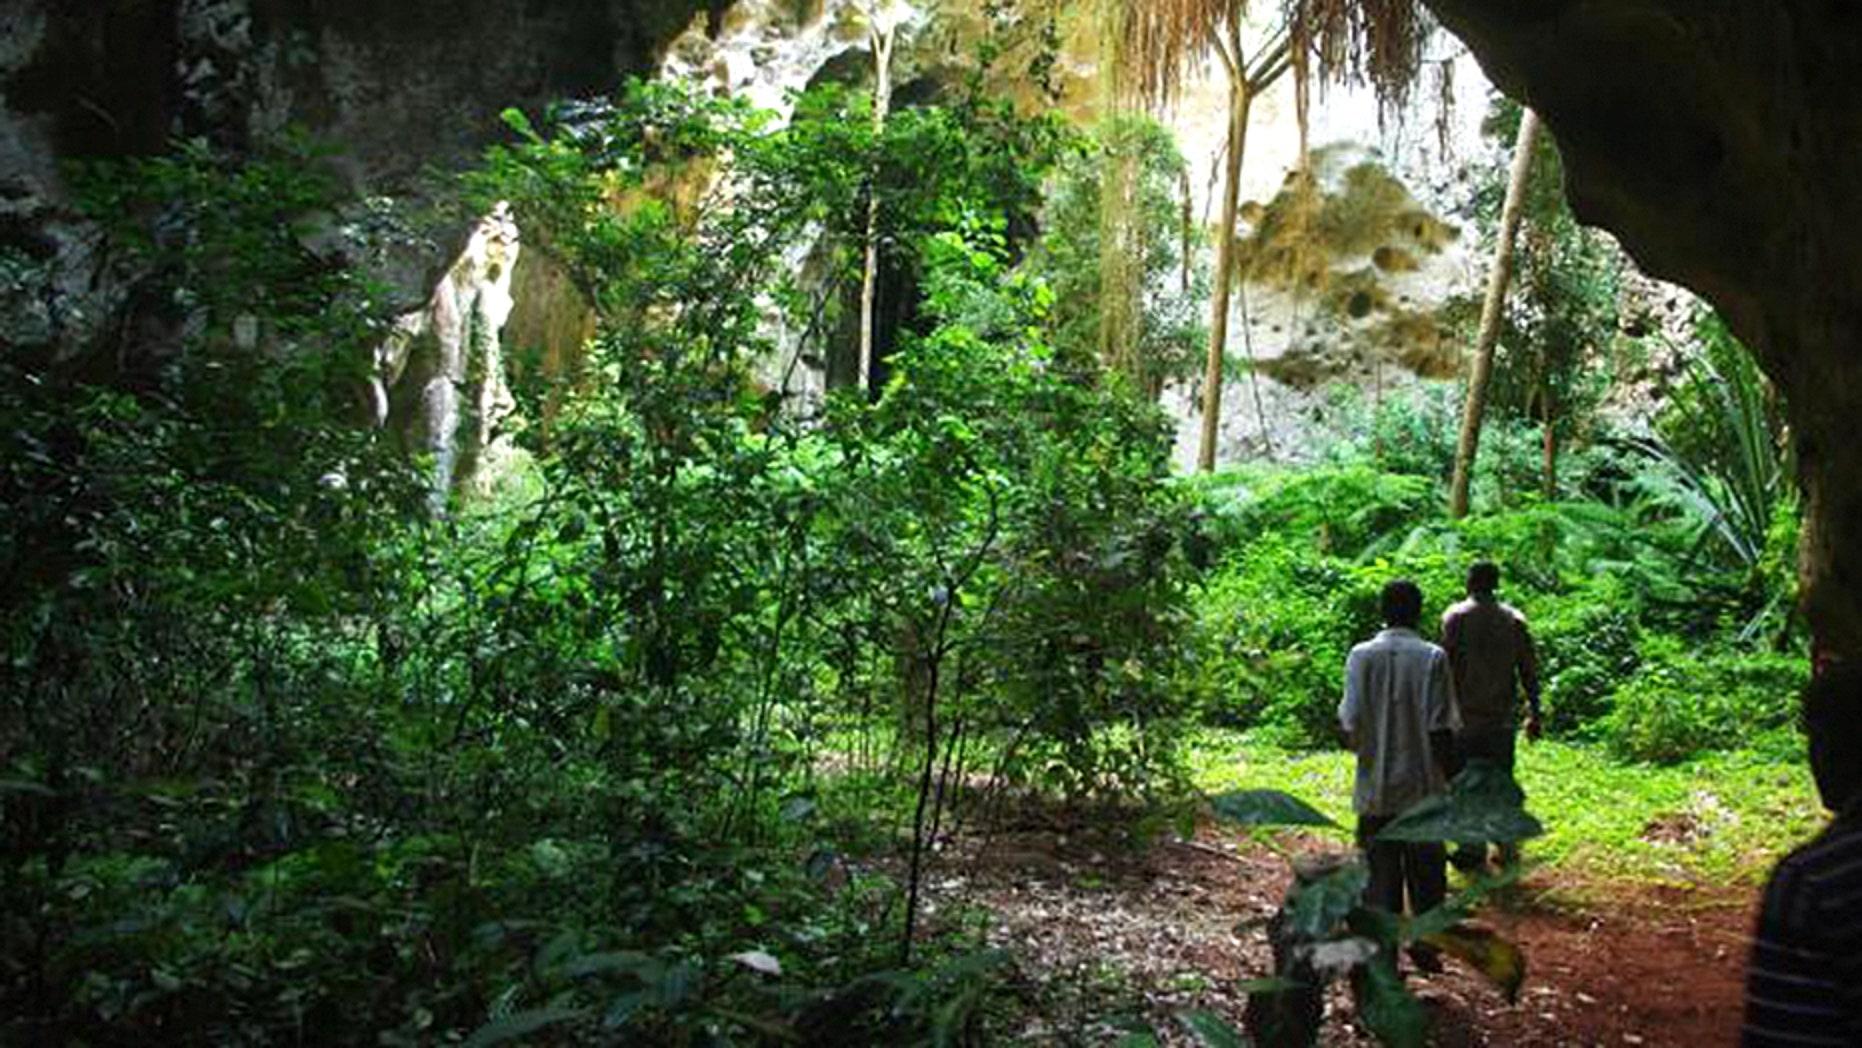 Kenya Caves (Credit: Australian National University)